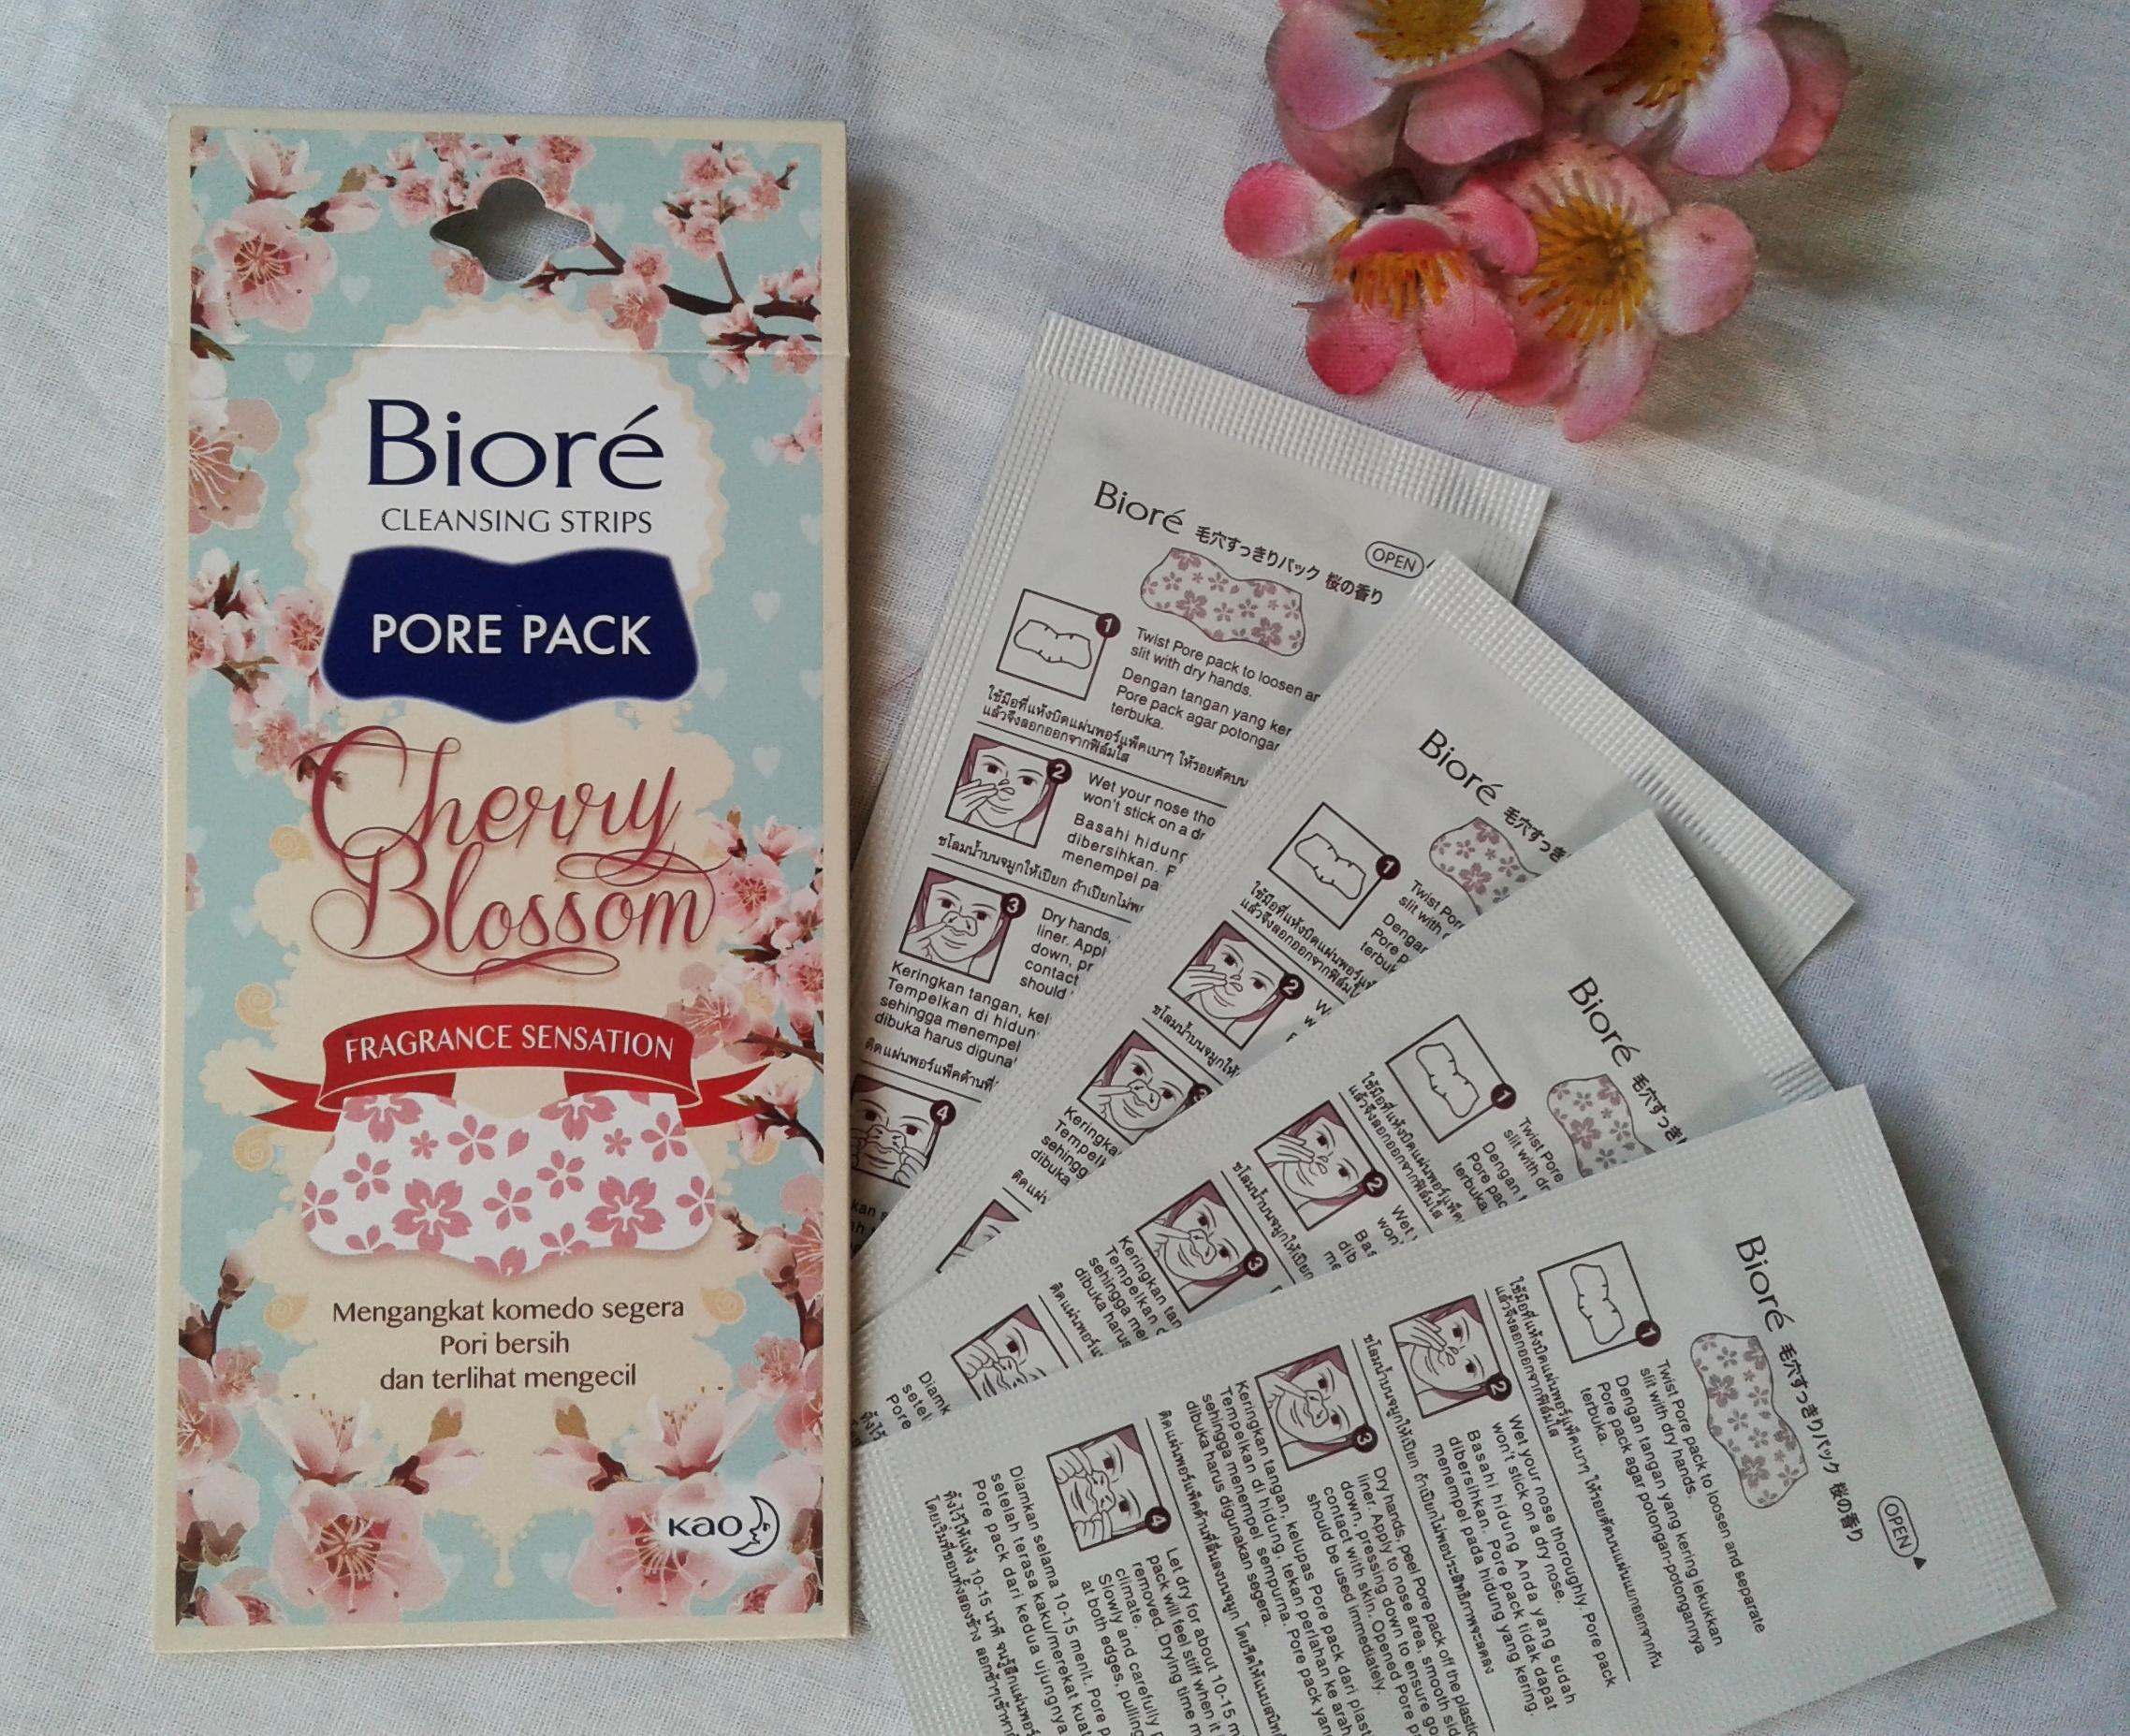 gambar review ke-1 untuk Biore Pore Pack Cherry Blossom Fragrance Sensation